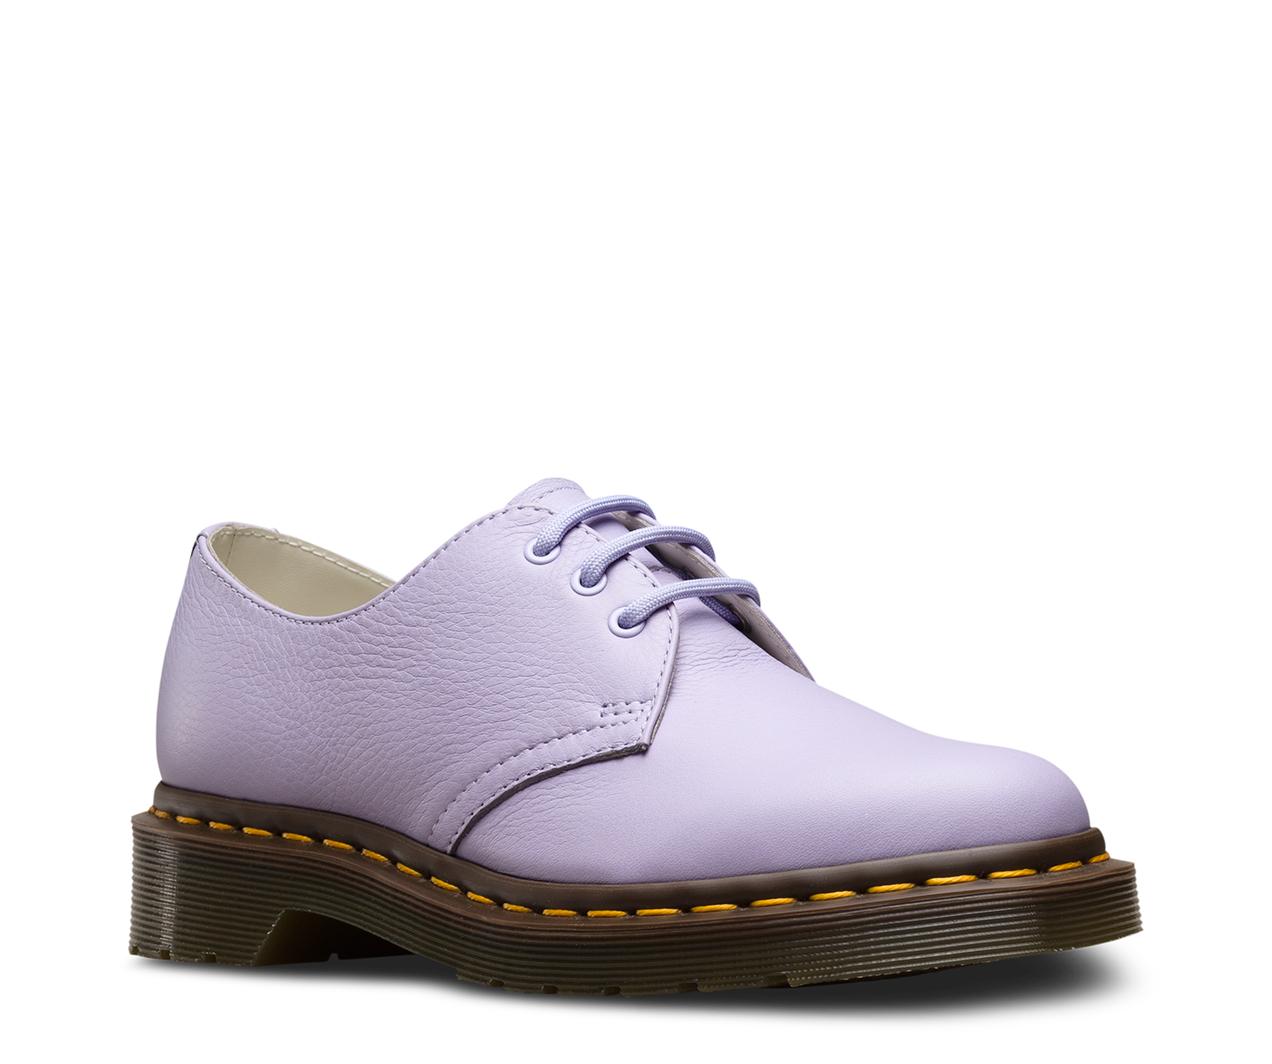 c4243e28b68c9 1461 VIRGINIA   Womens Shoes   The Official FR Dr Martens Store